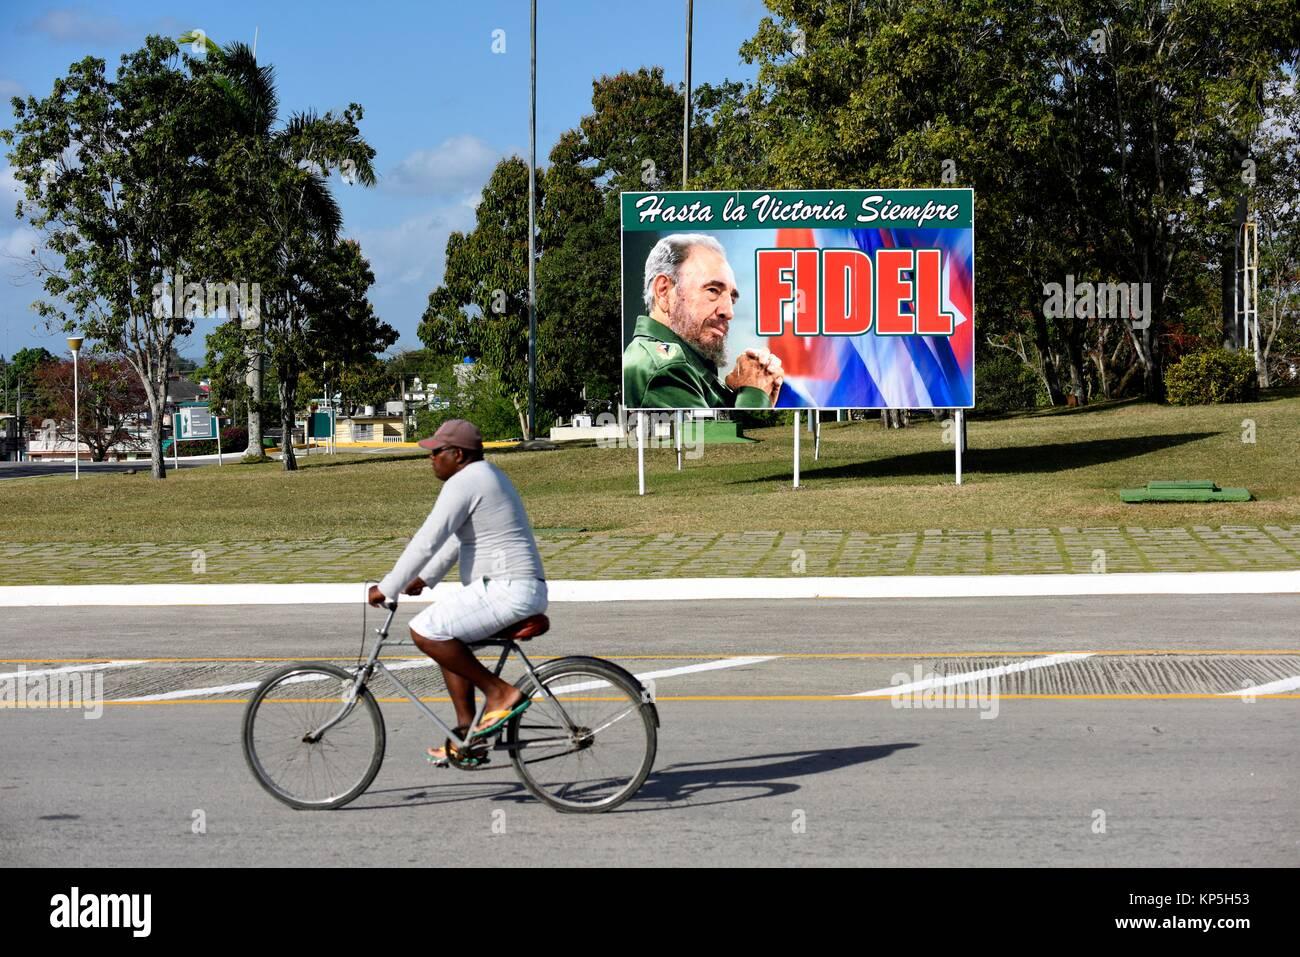 Politische Propaganda Plakat für Fidel Castro, Santa Clara, Kuba. Stockbild